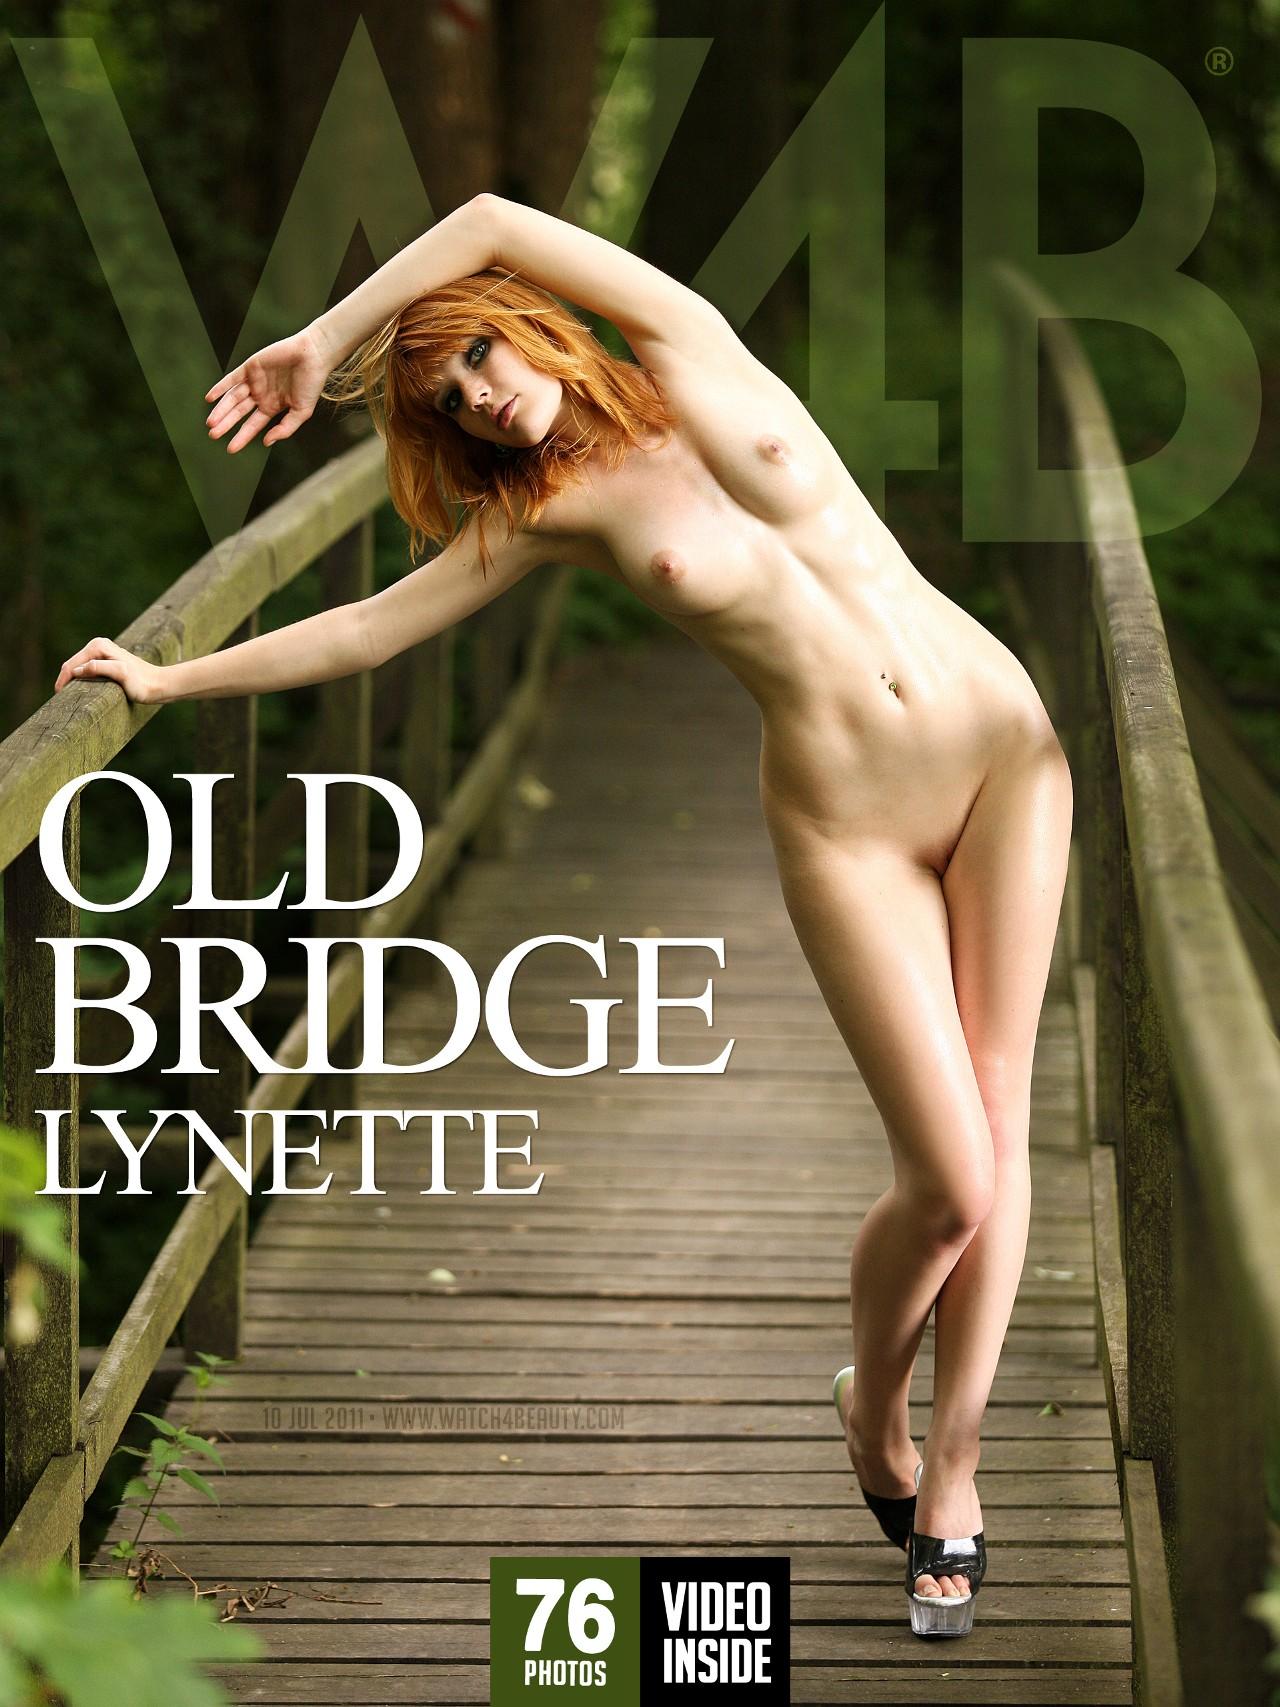 Lynette: Old bridge